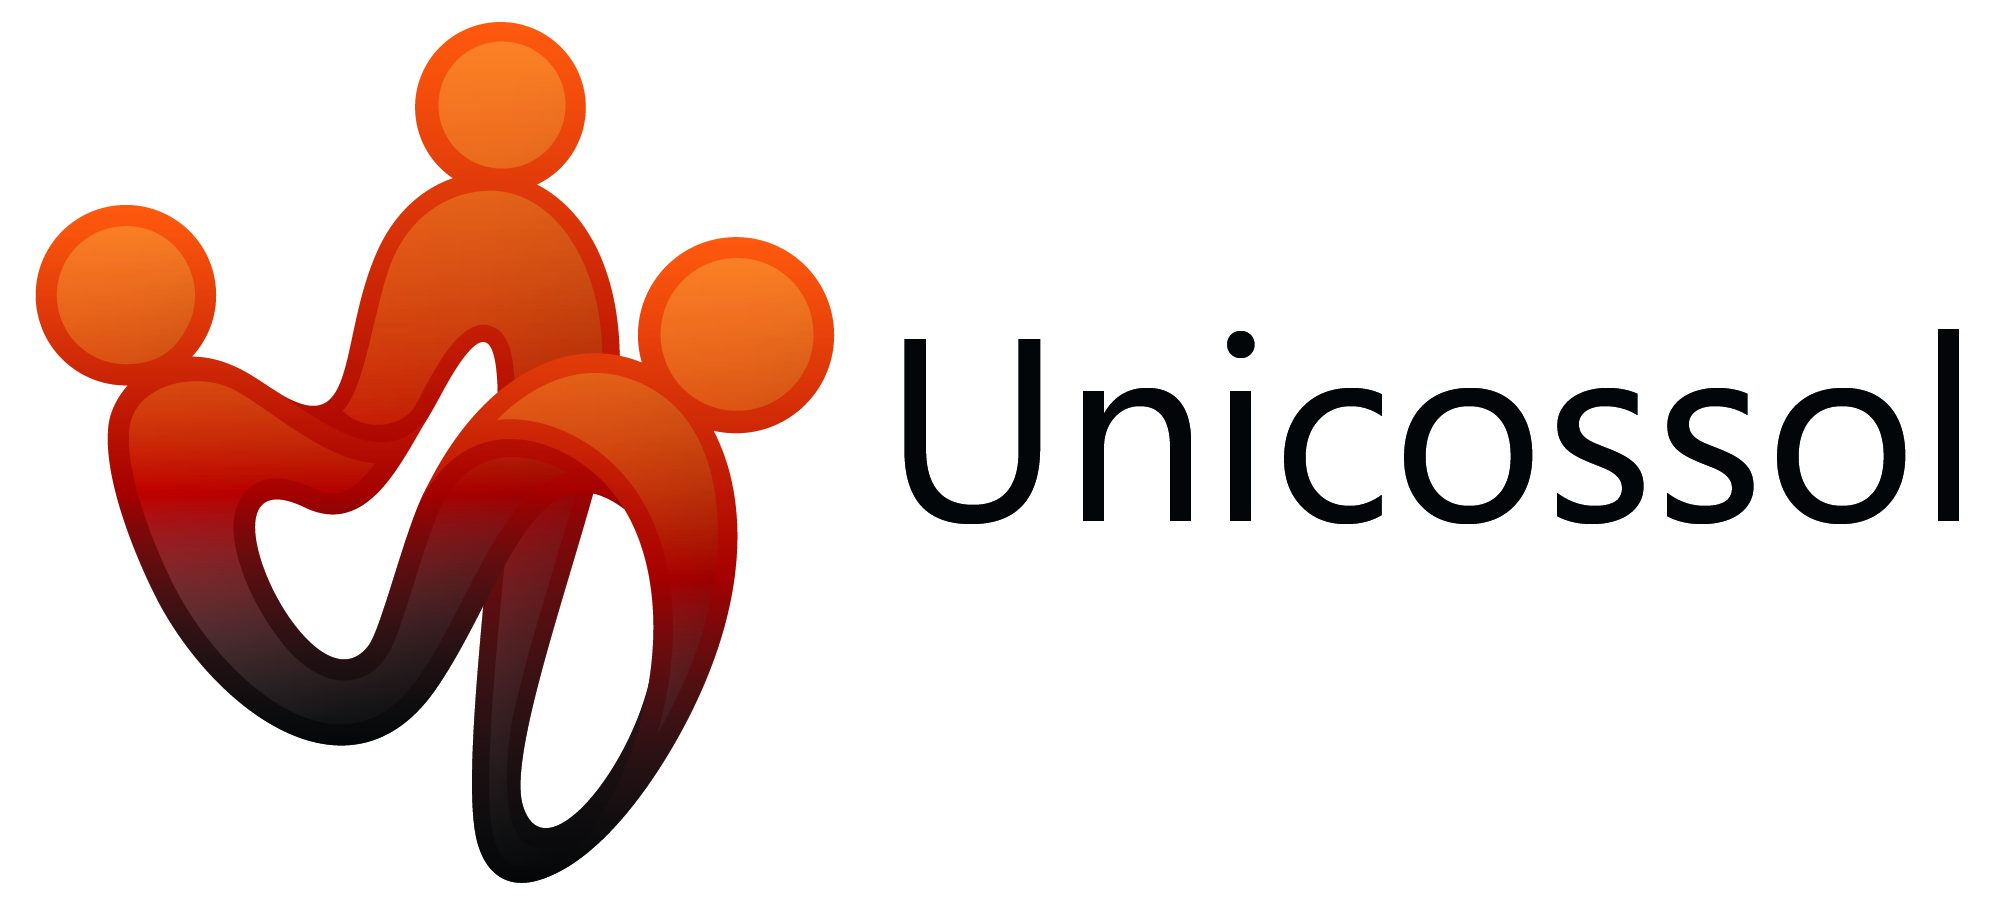 Unicossol